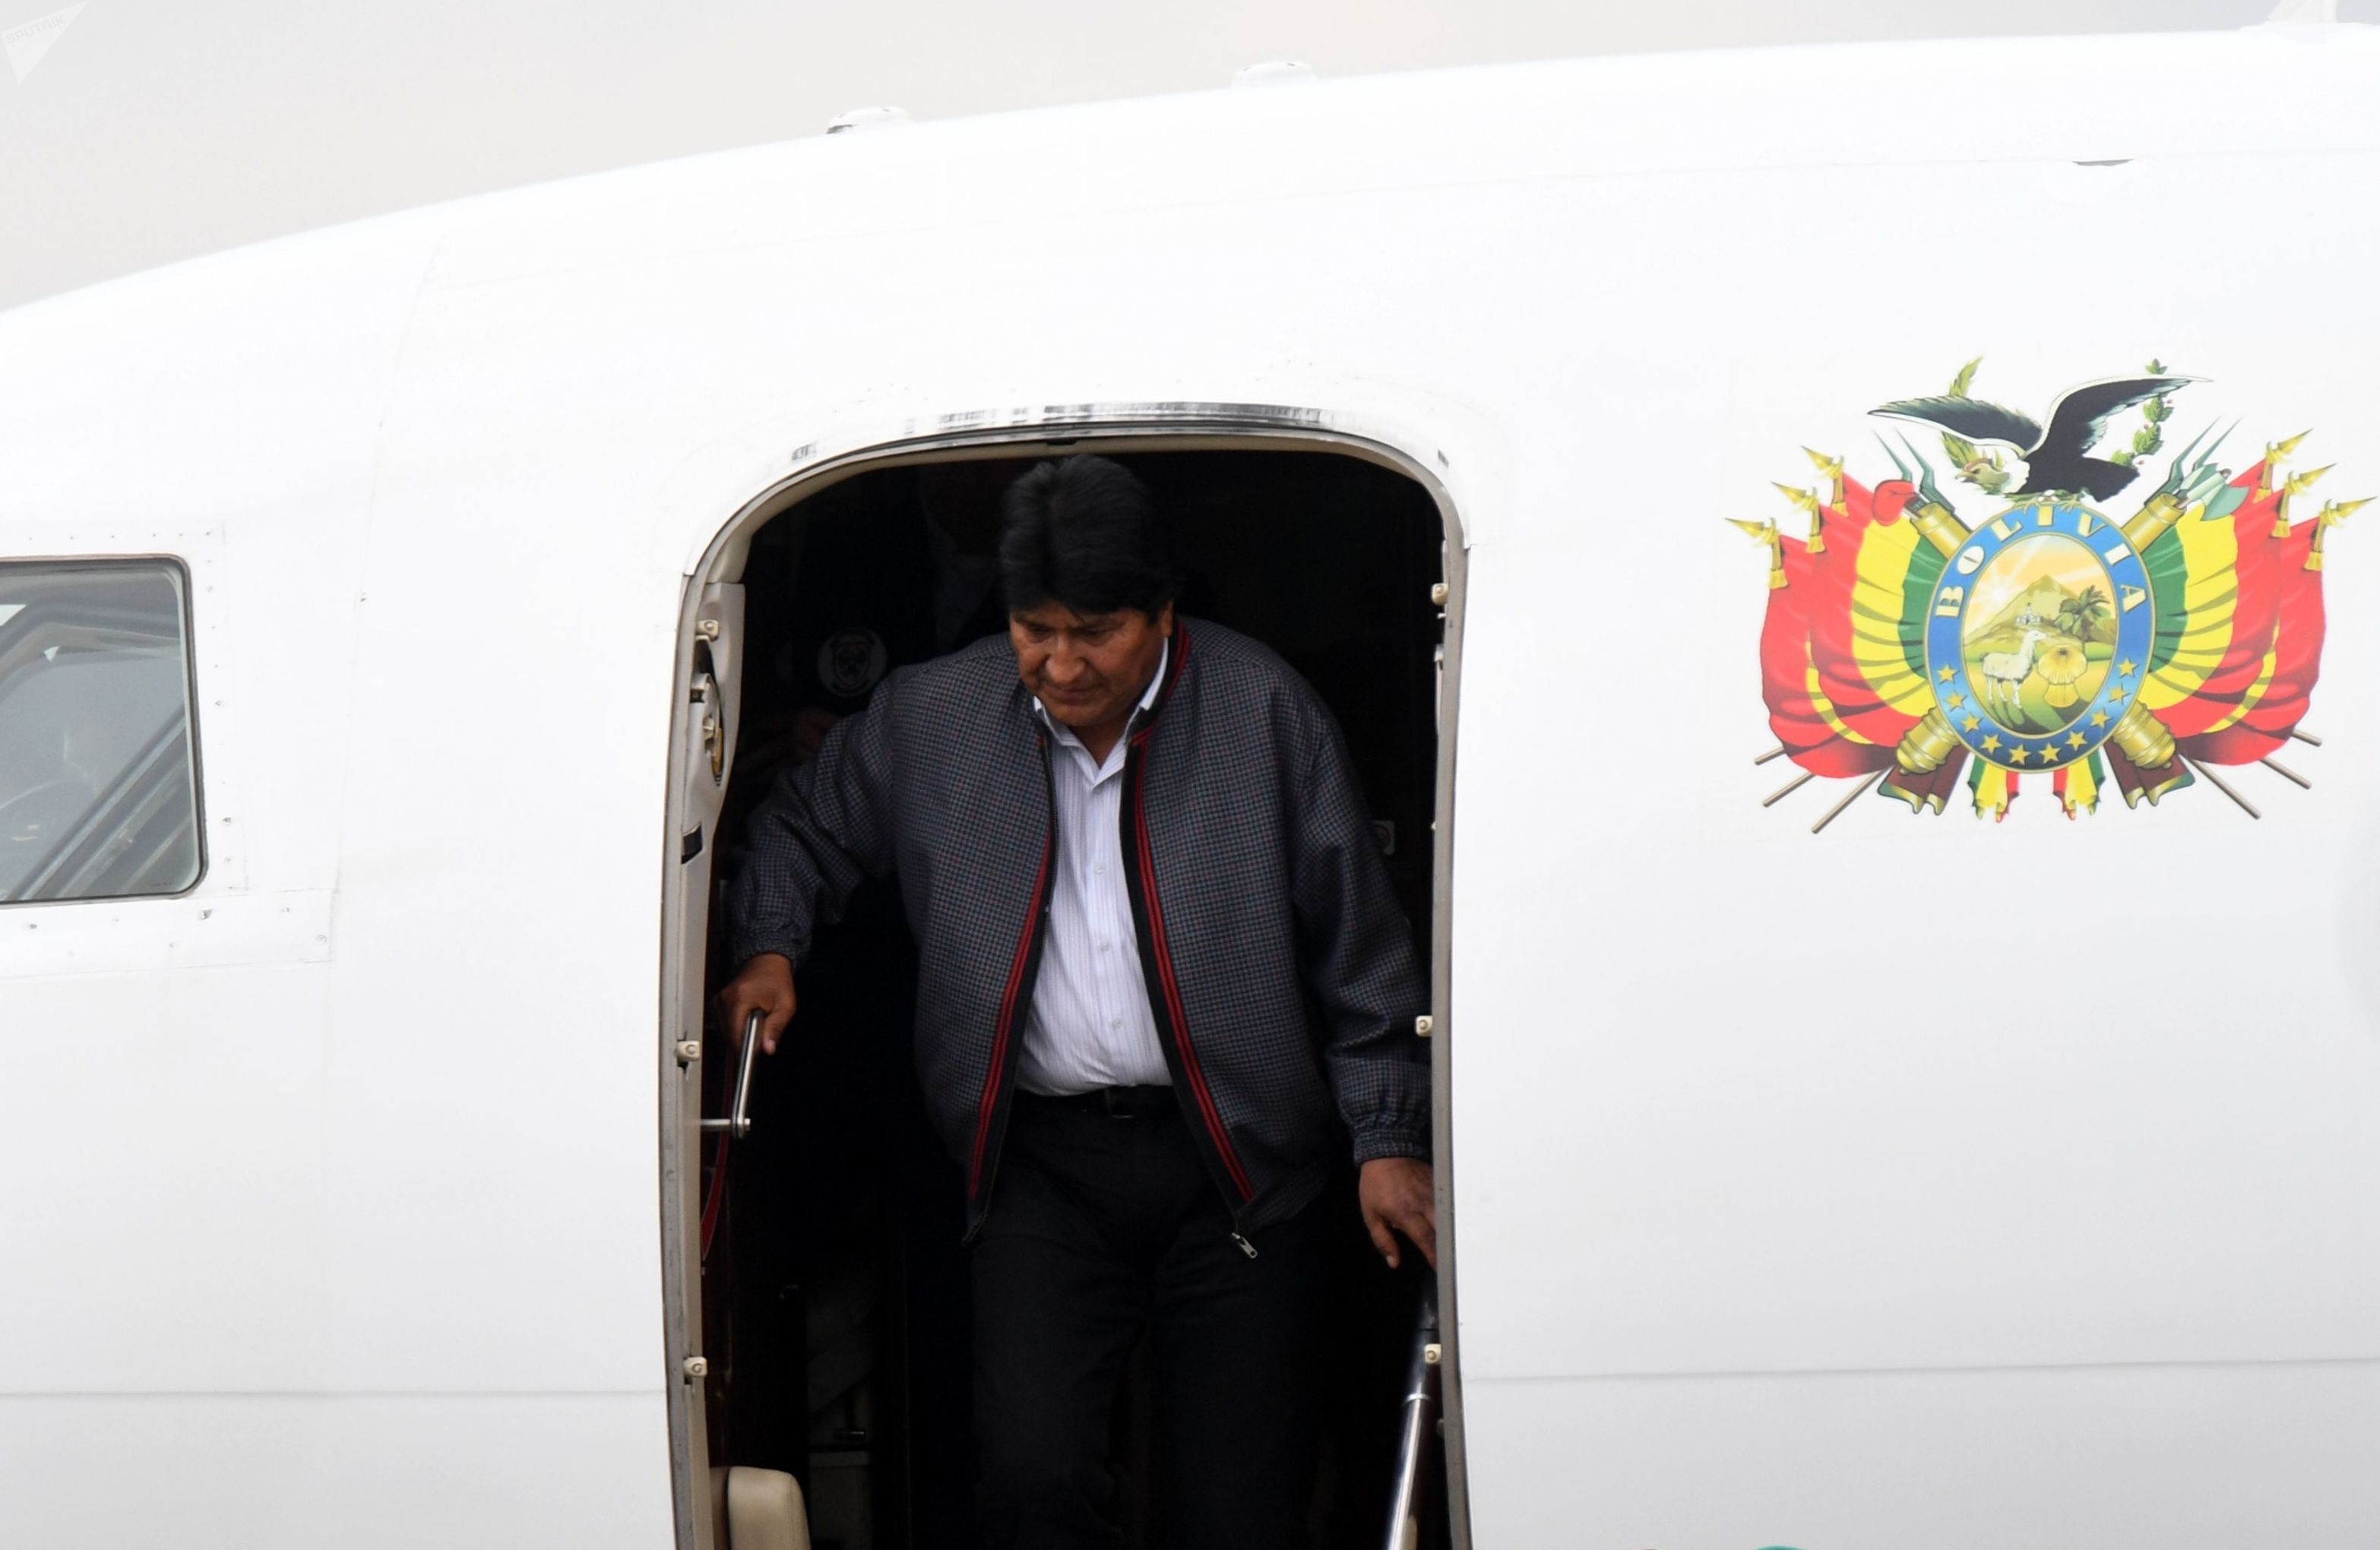 El presidente de Bolivia, Evo Morales, llega a Moscú